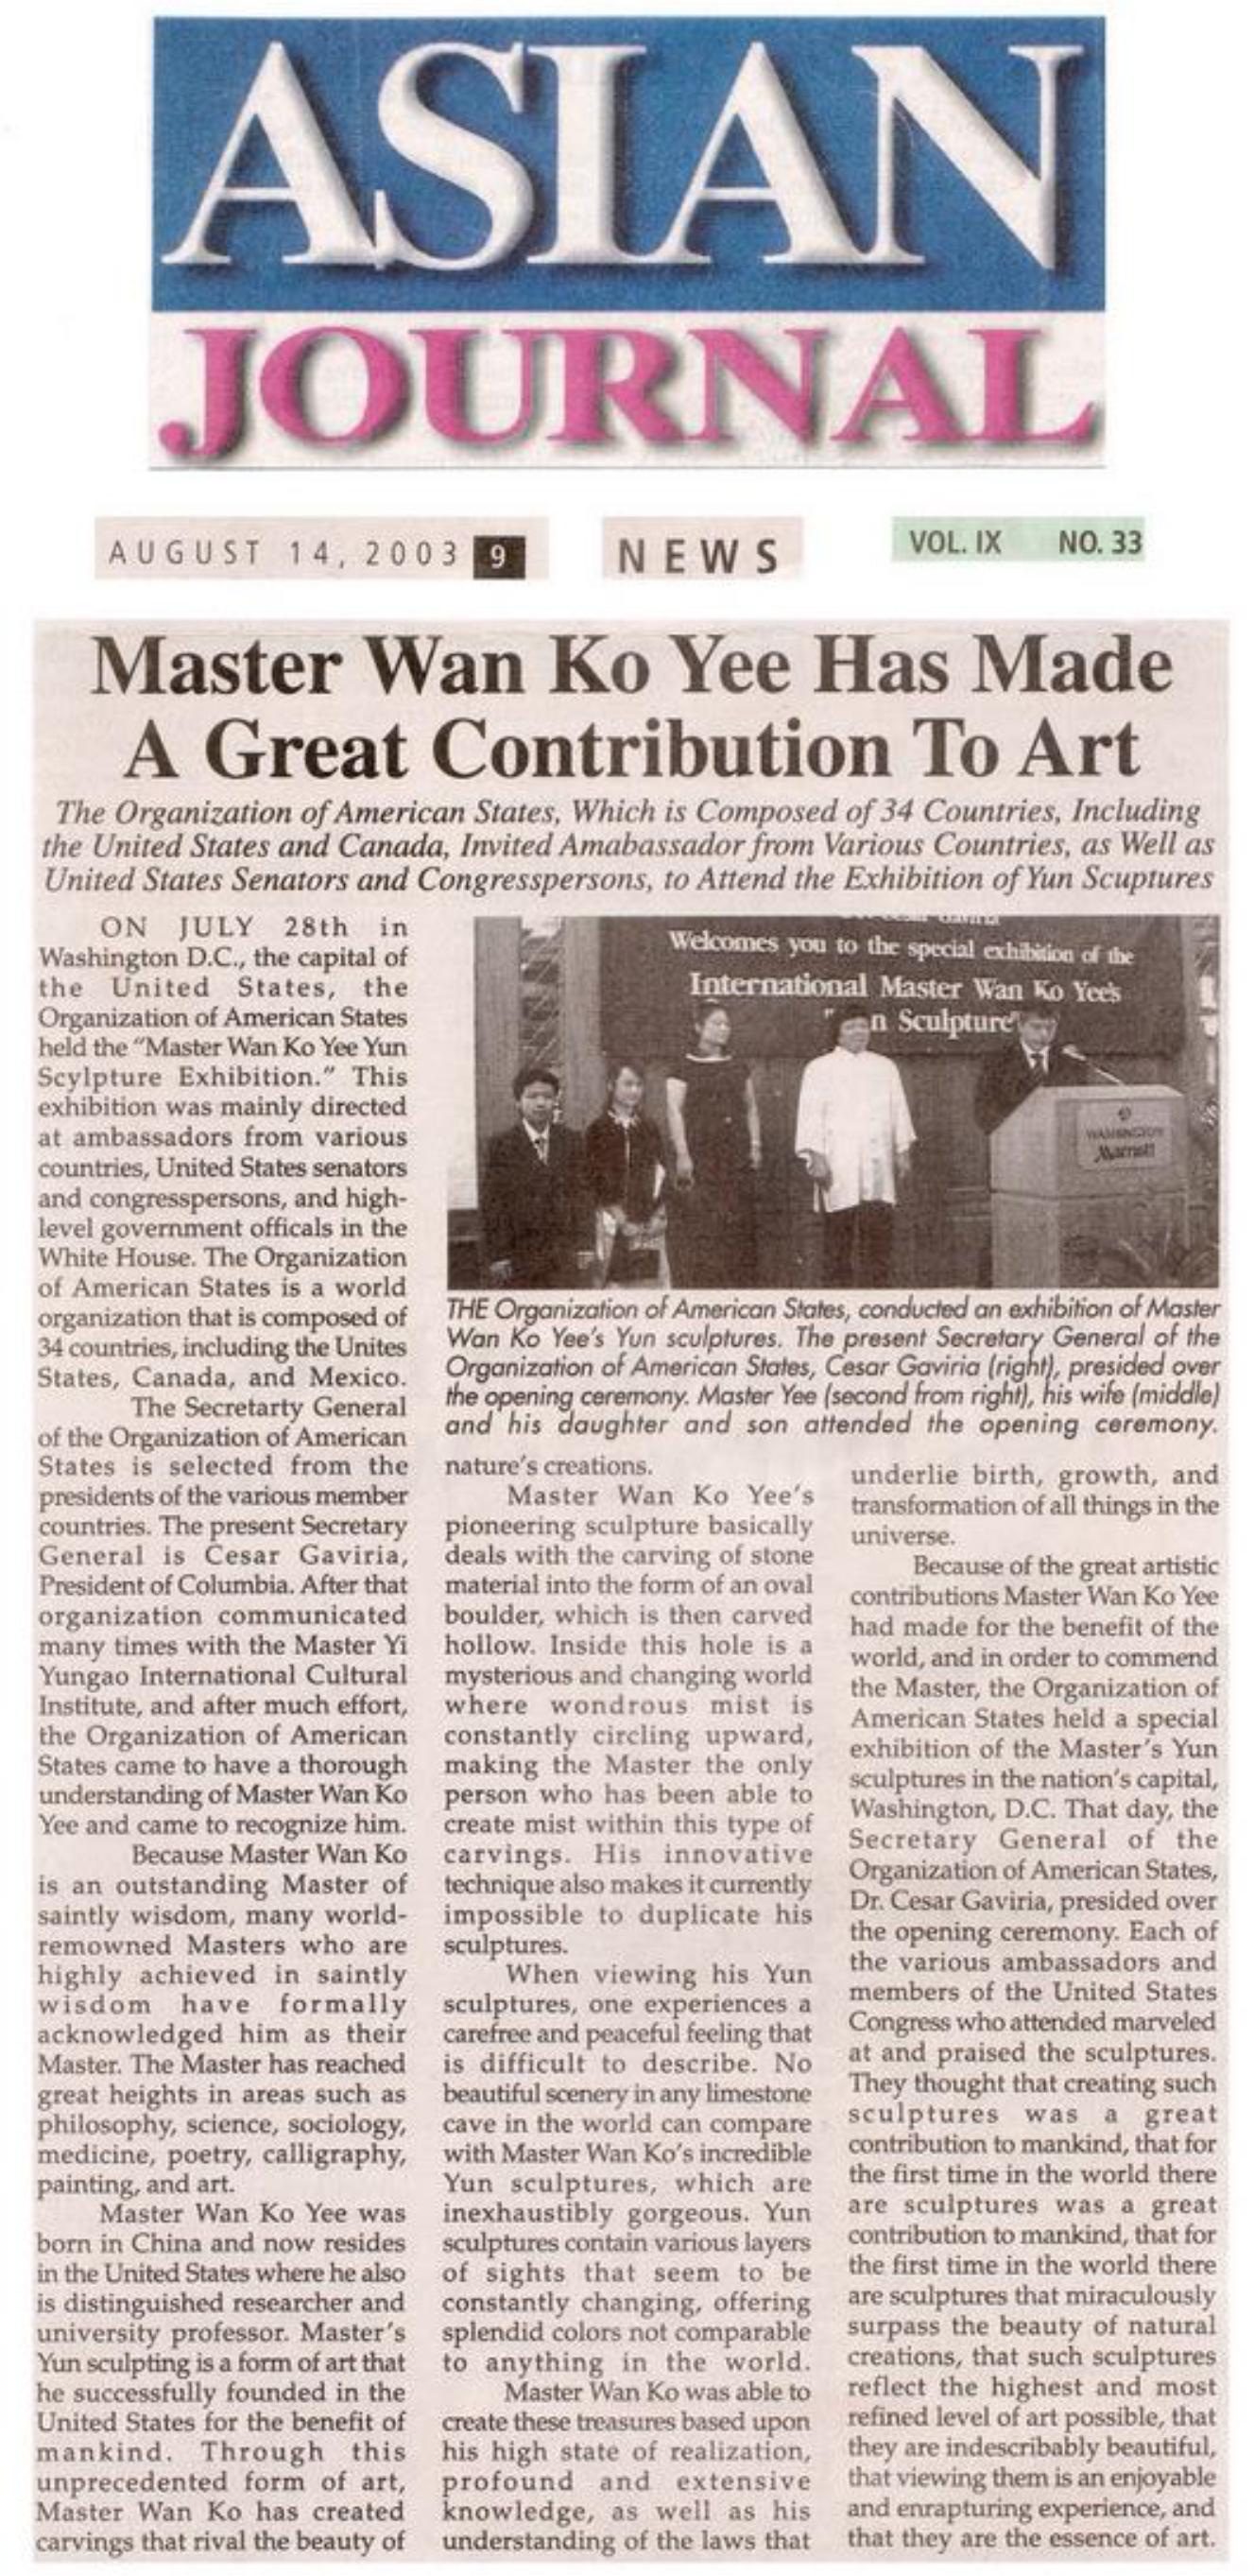 Master-Wan-Ko-Yee-H.H.-Dorje-Chang-Buddha-III-Has-Made-A-Great-Contribution-To-Art